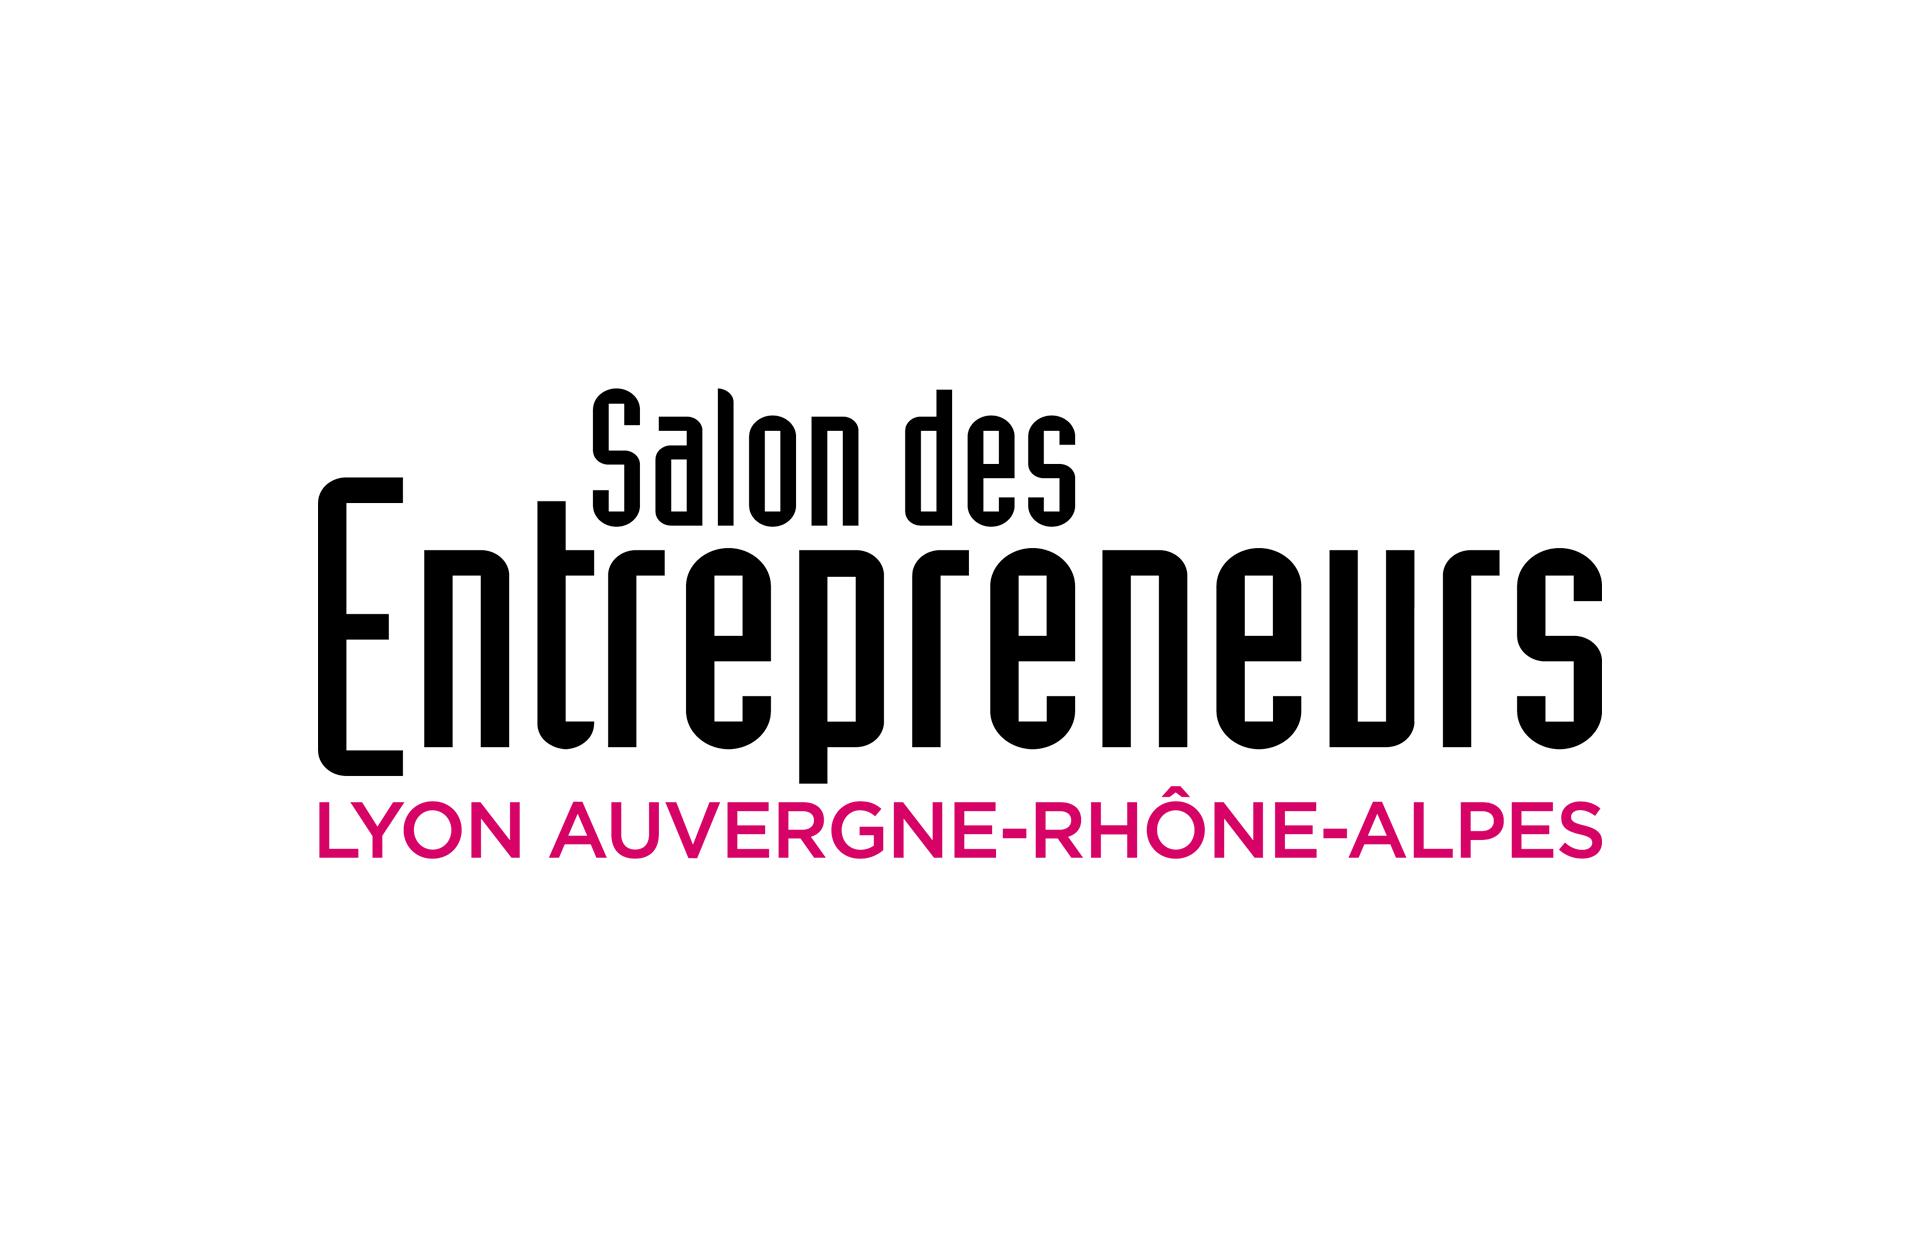 Salon des entrepreneurs de lyon 13 14 06 widoobiz - Salon des entrepreneurs de lyon ...